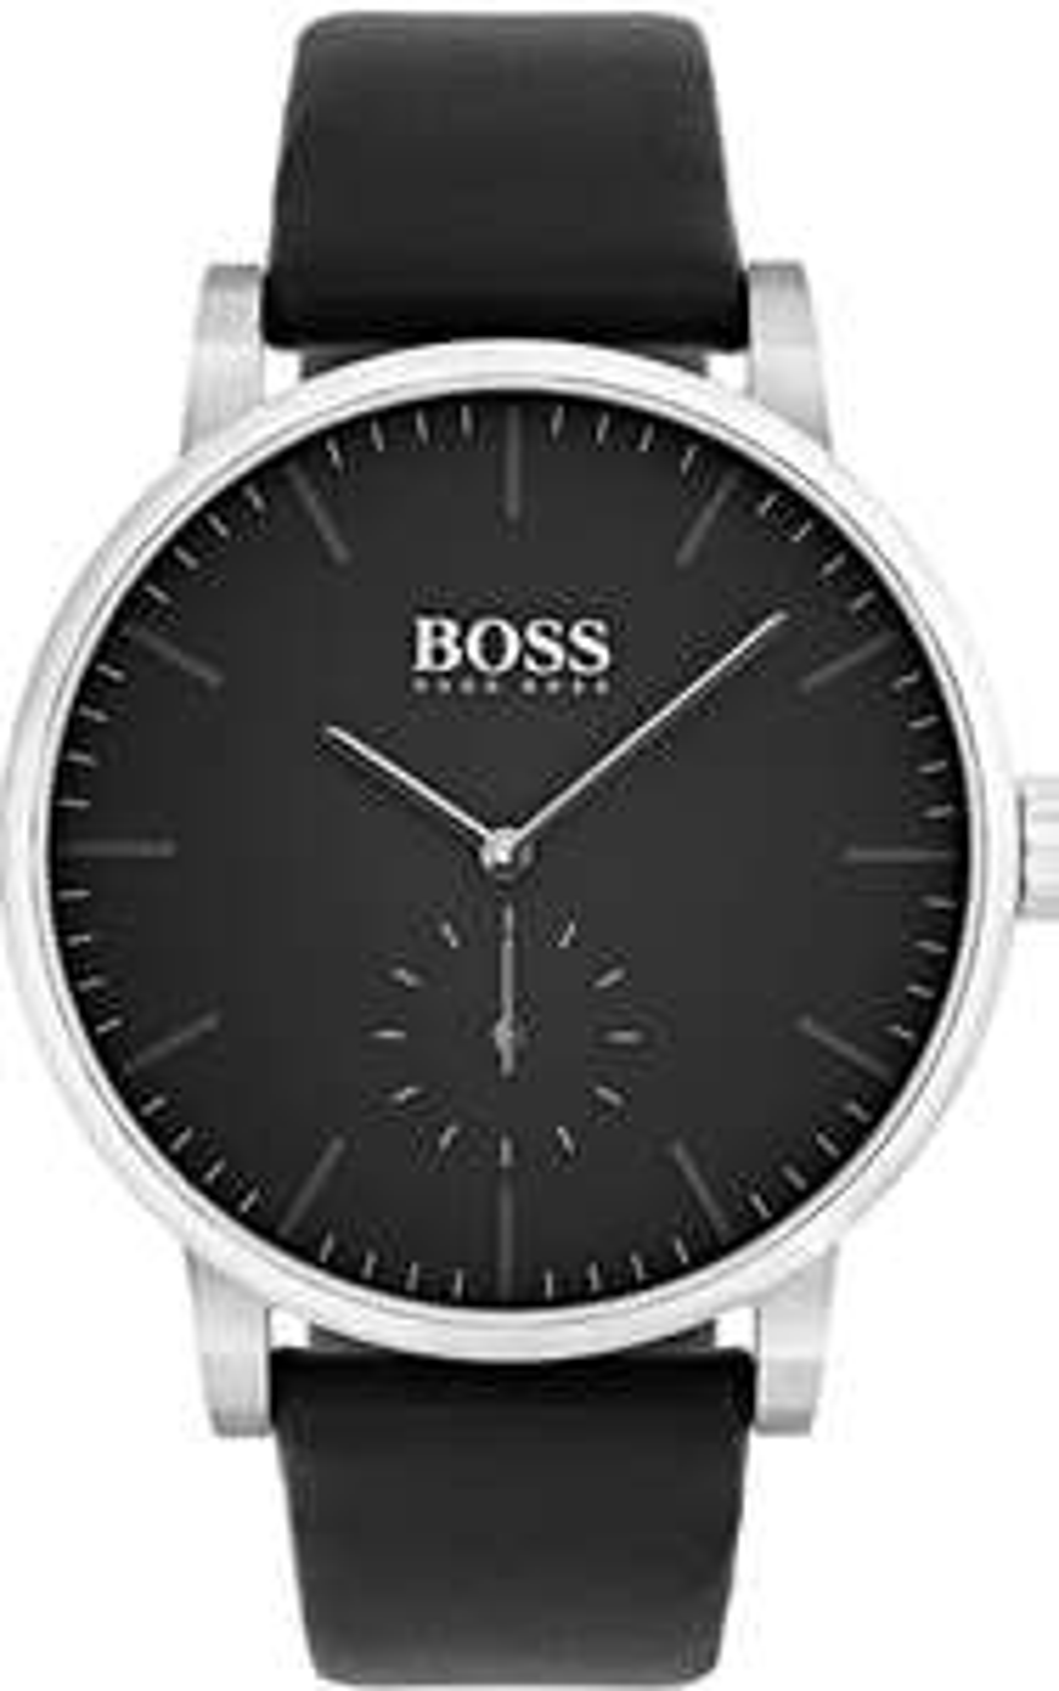 Amazon Angebot Hugo Boss Quarz Uhr 1513500